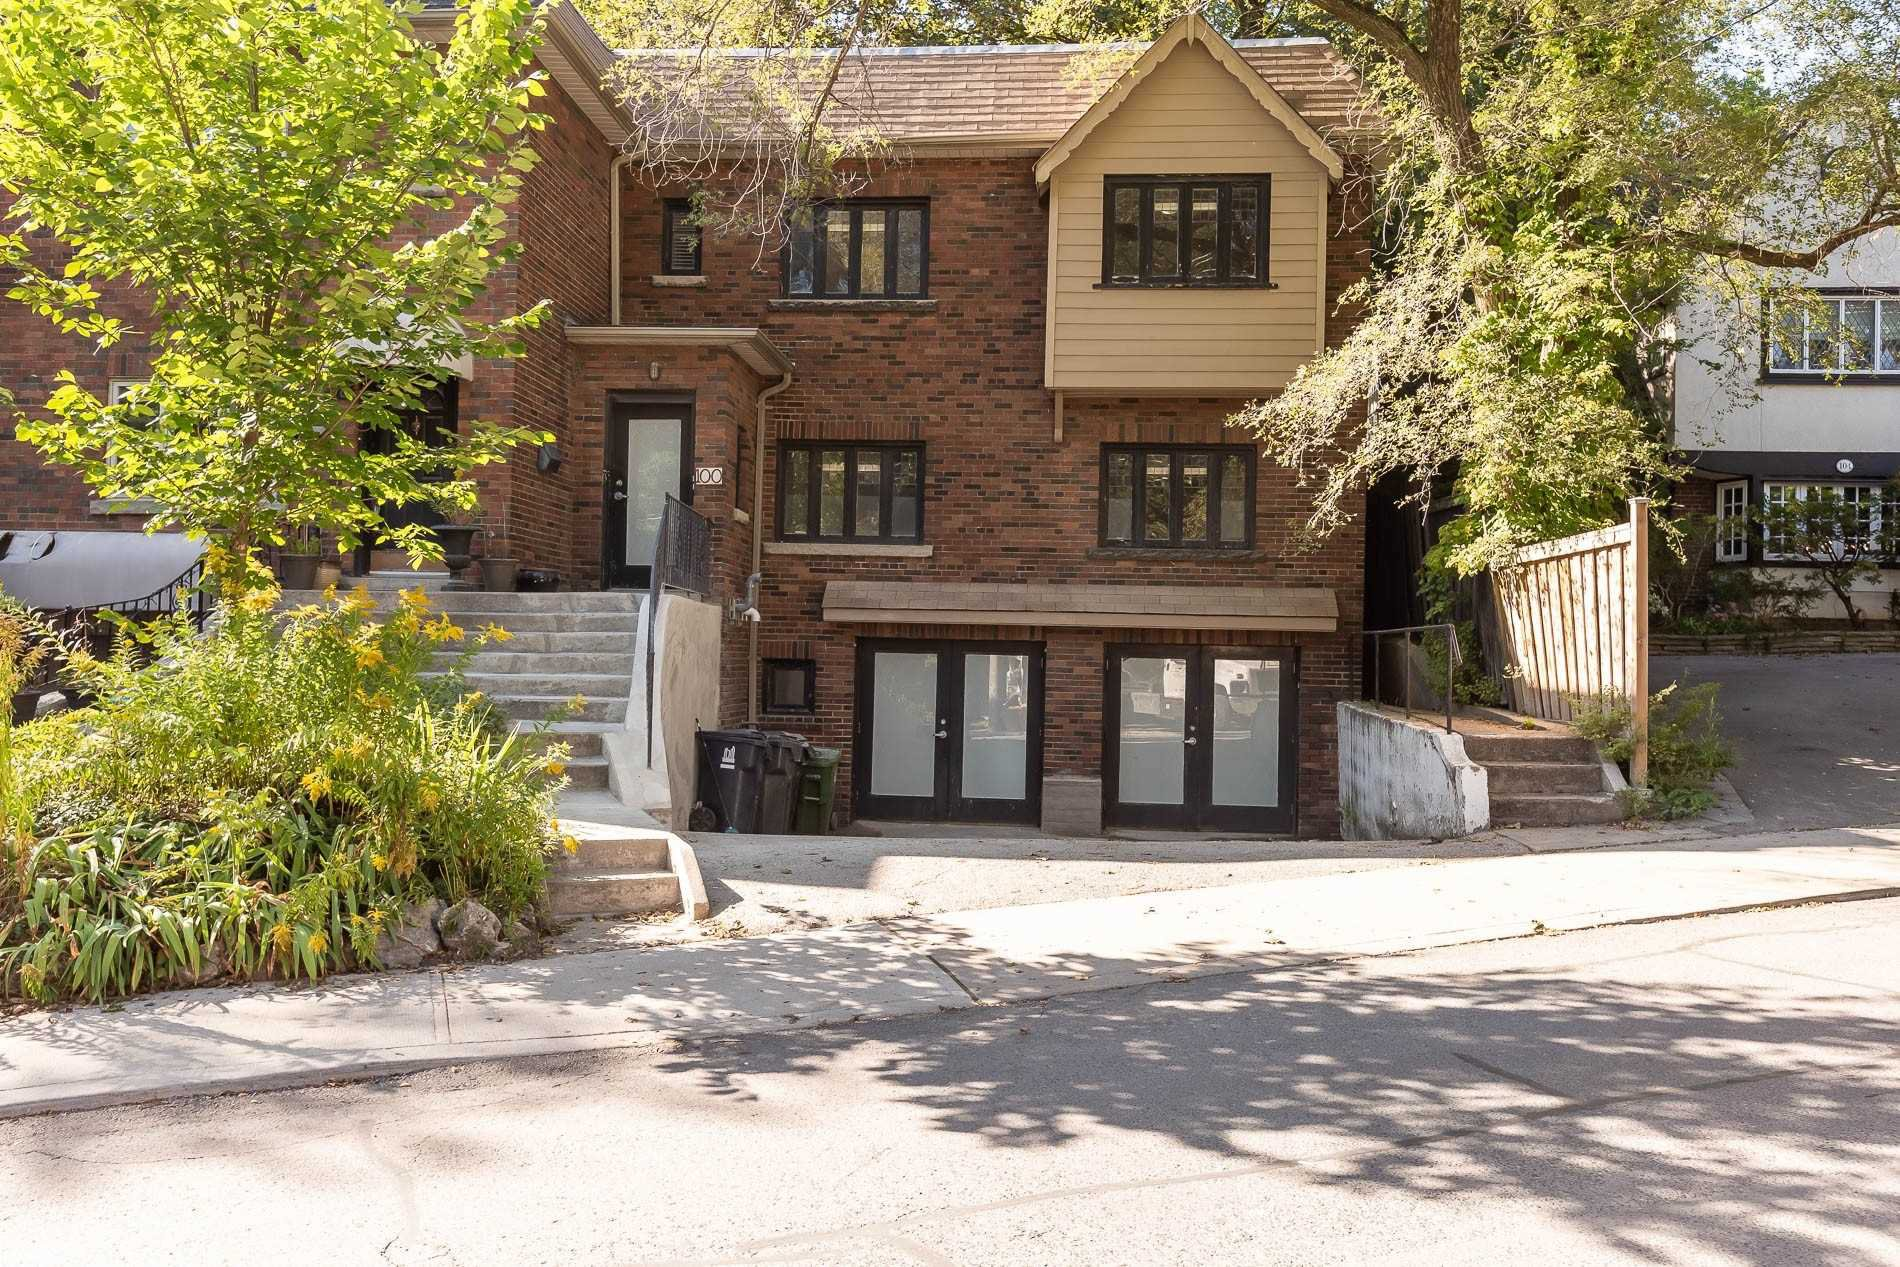 Main Photo: 100 Poplar Plains Road in Toronto: Casa Loma House (2-Storey) for sale (Toronto C02)  : MLS®# C4581738